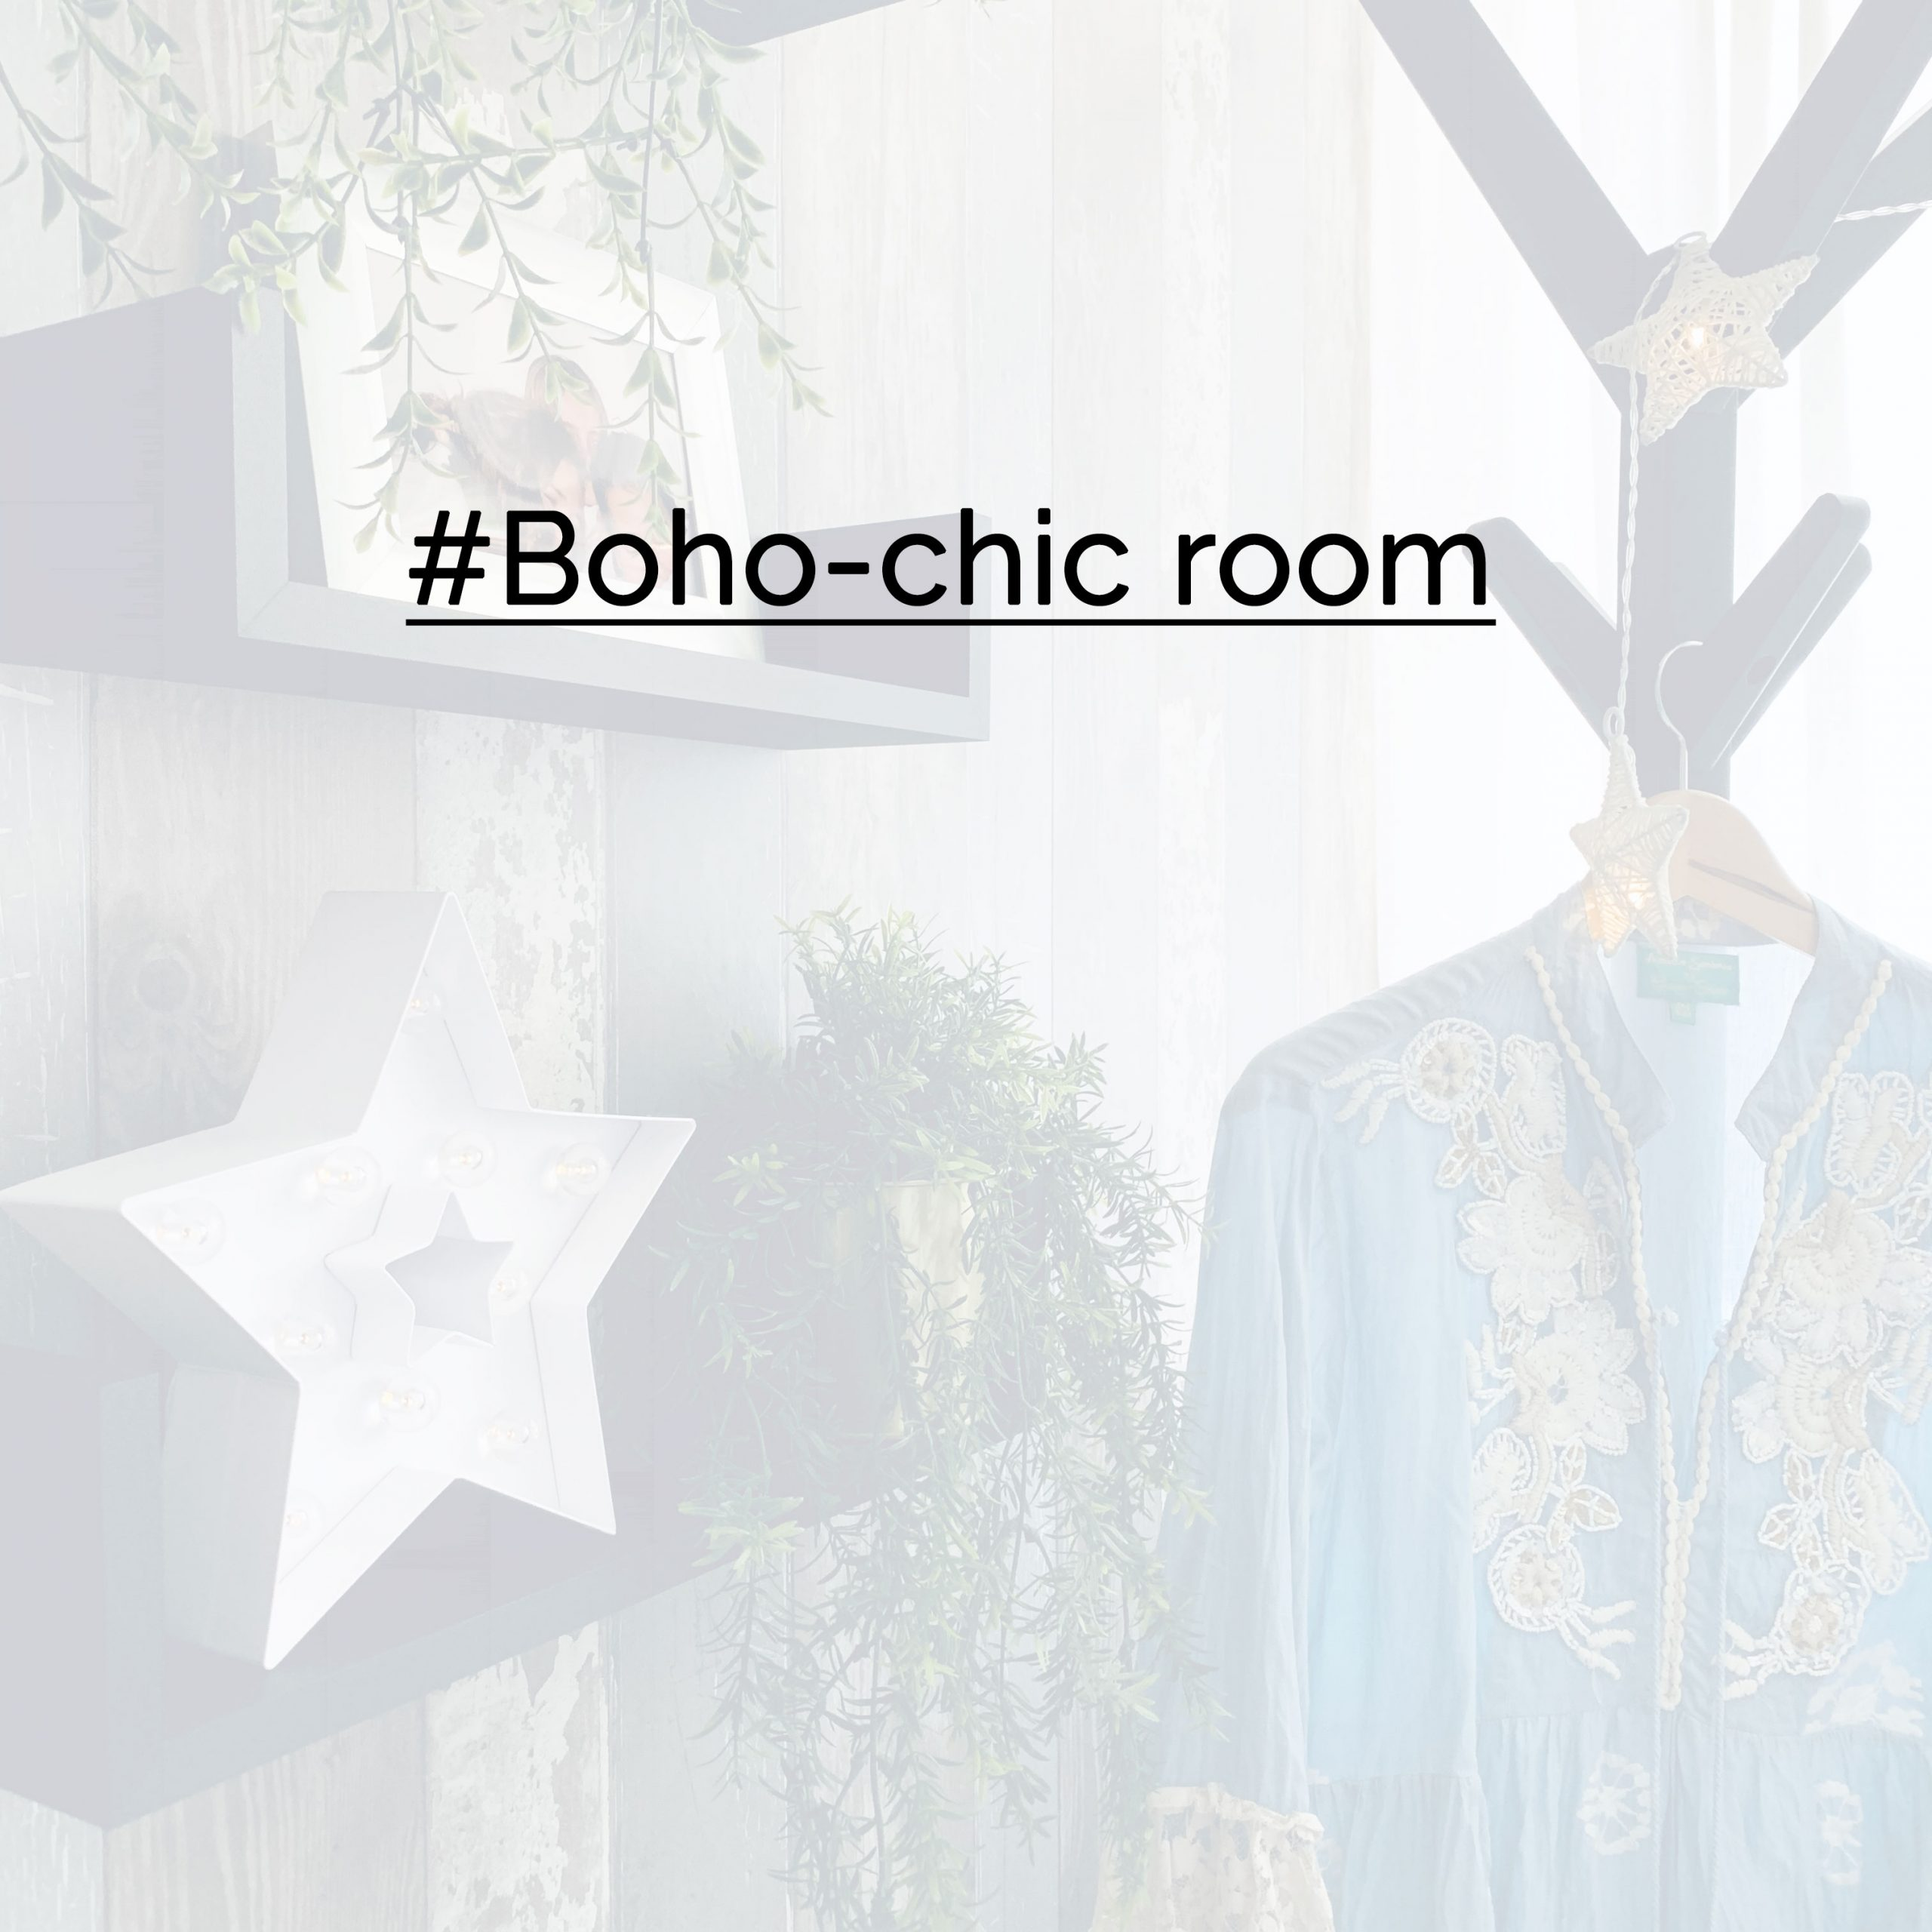 Boho-chic room